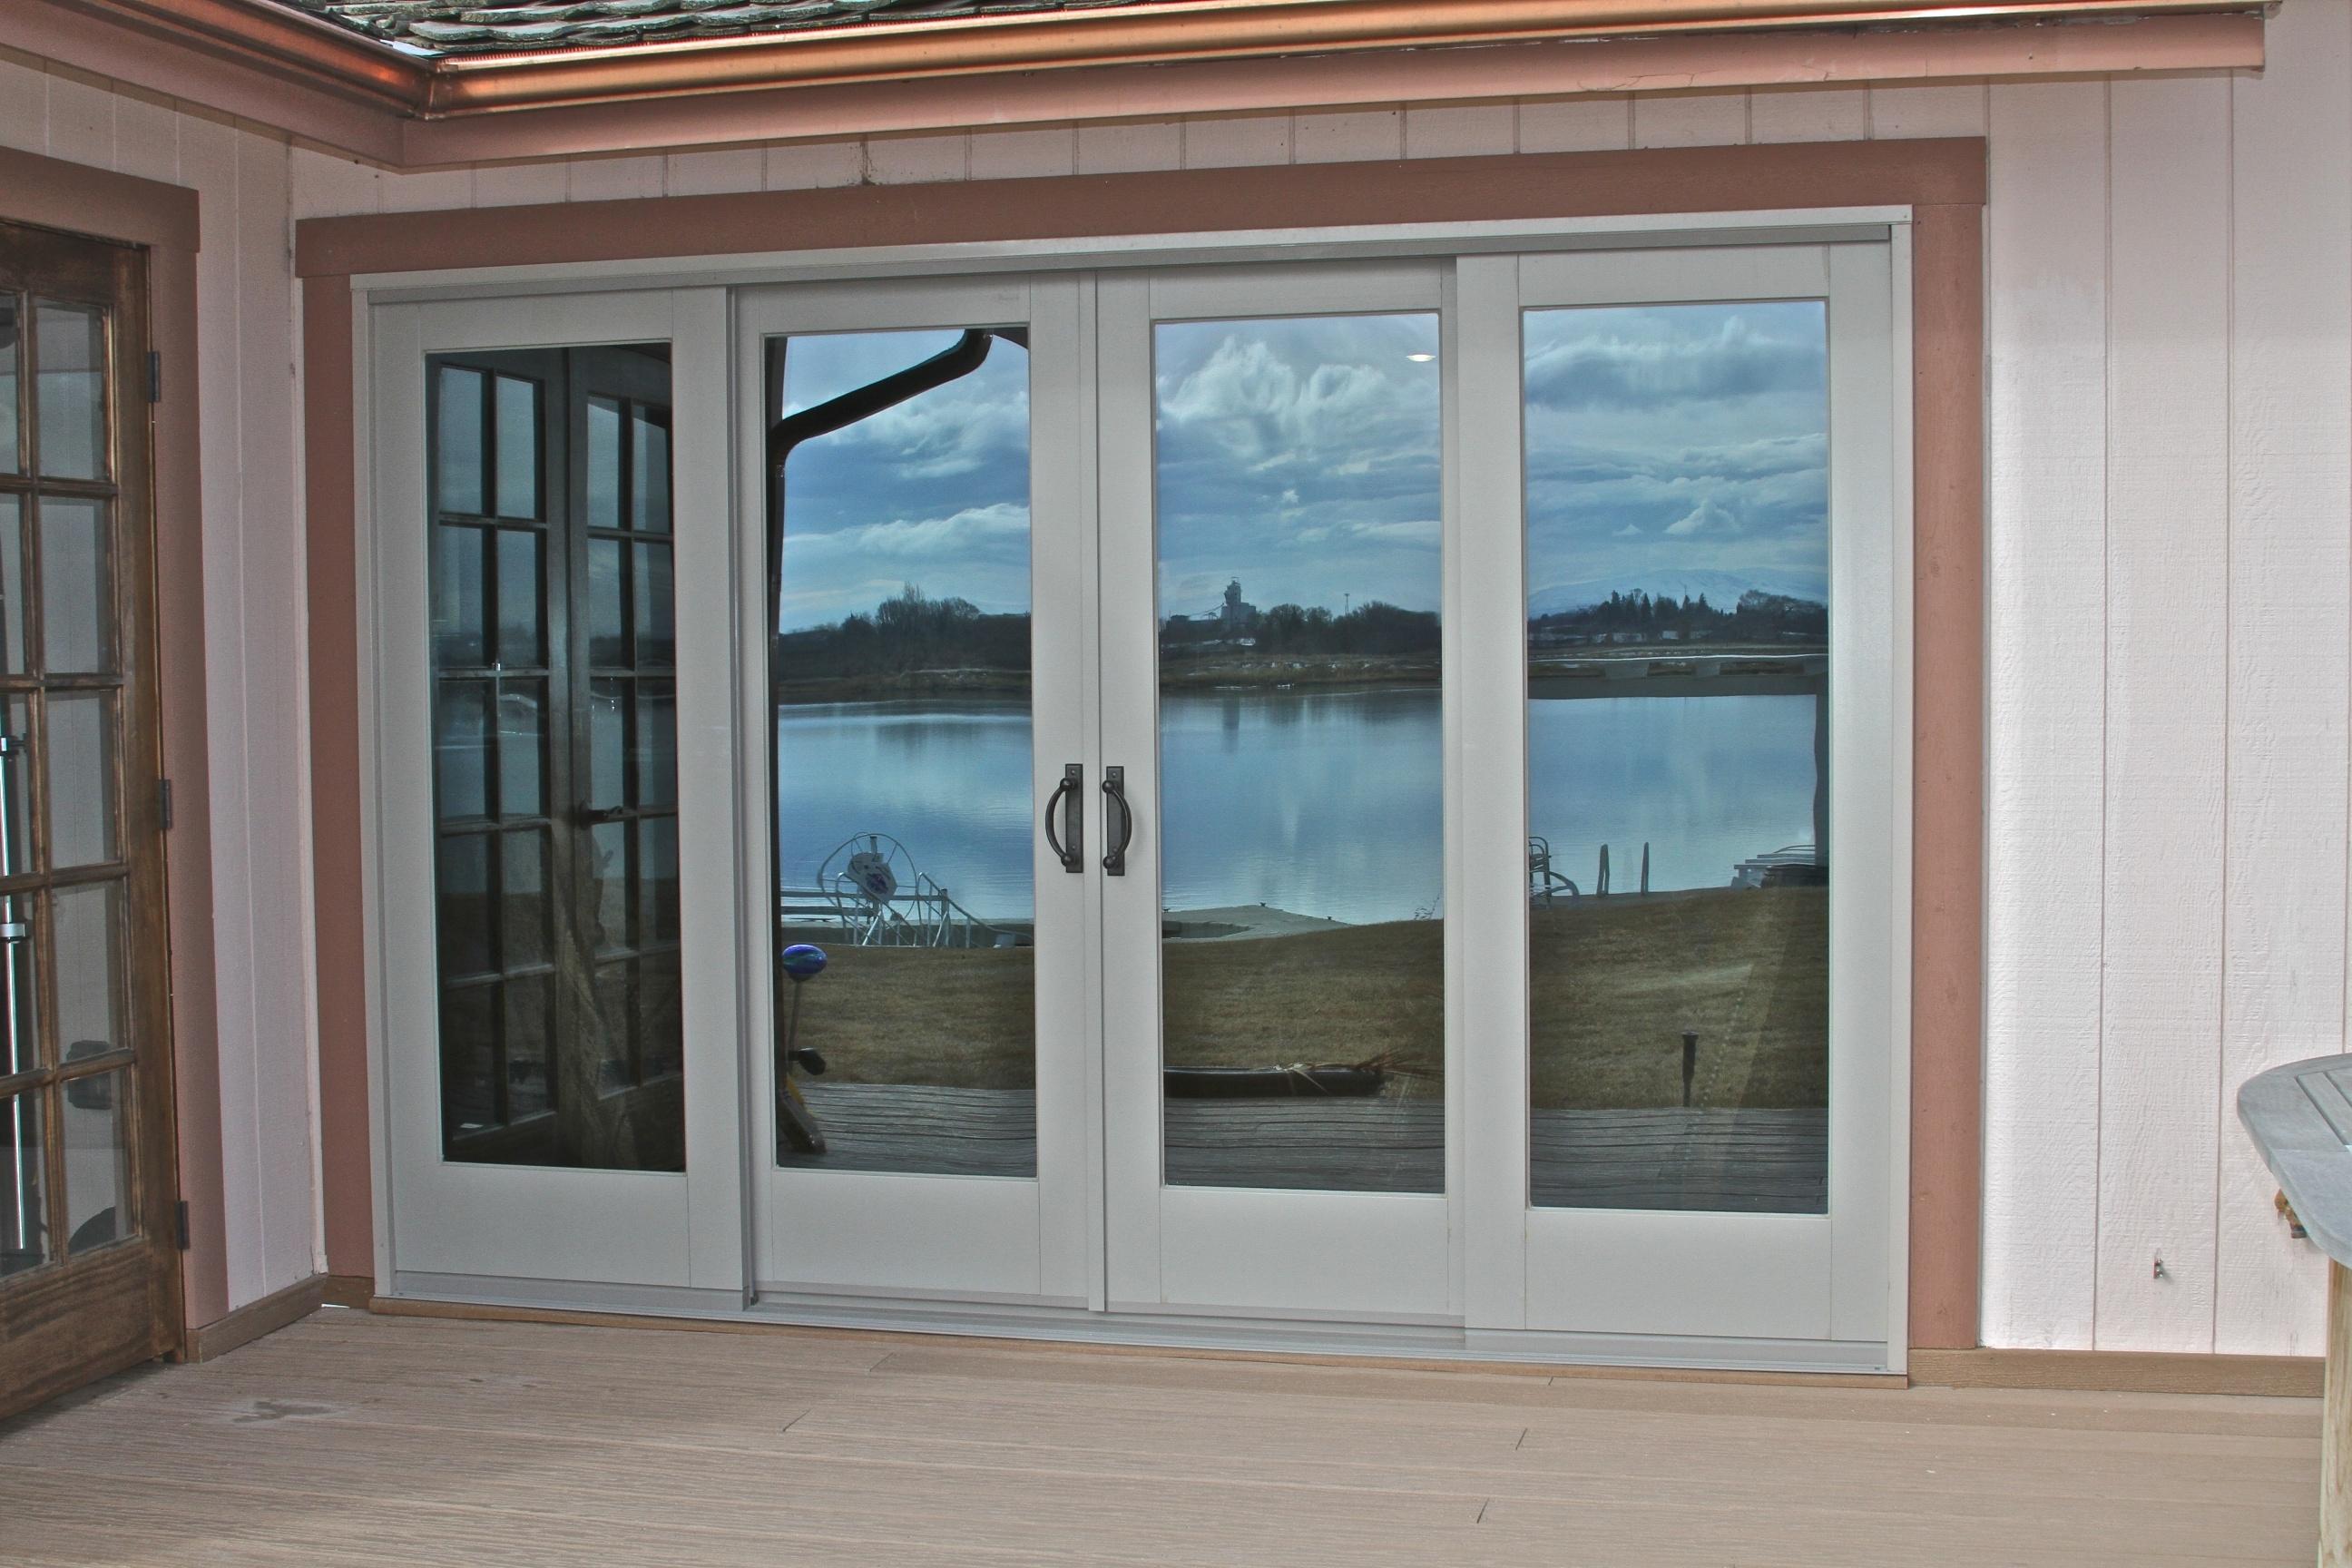 Sliding Glass Door With Sidelightssliding glass door with sidelights sliding doors design